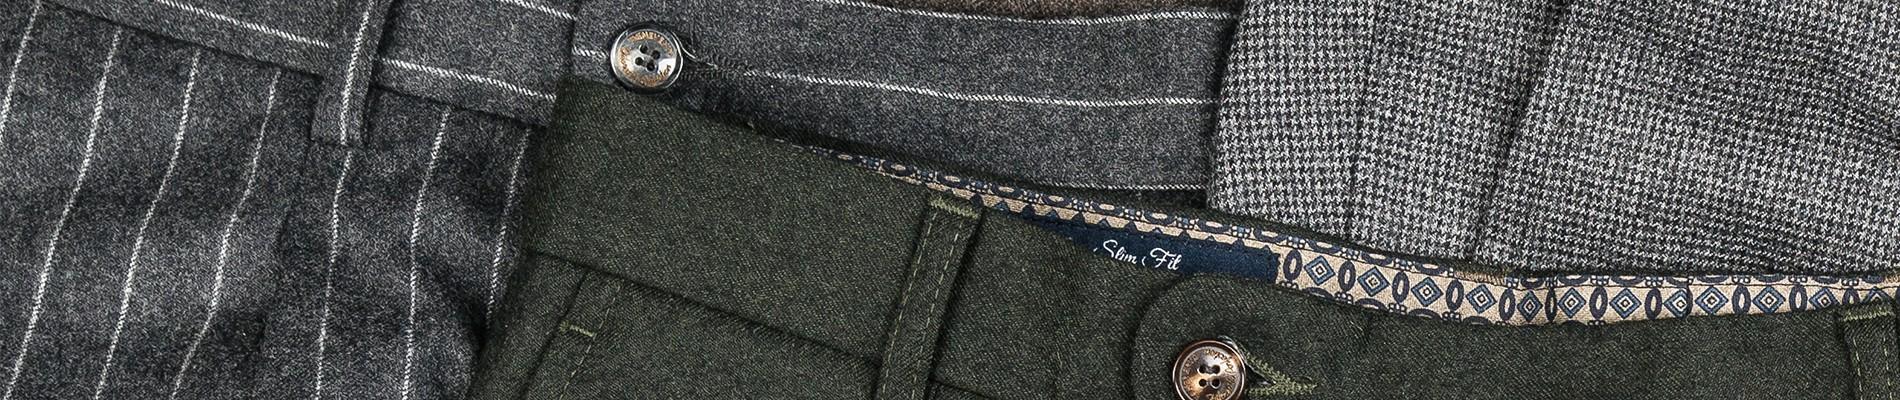 Spodnie flanelowe męskie | Benevento.pl